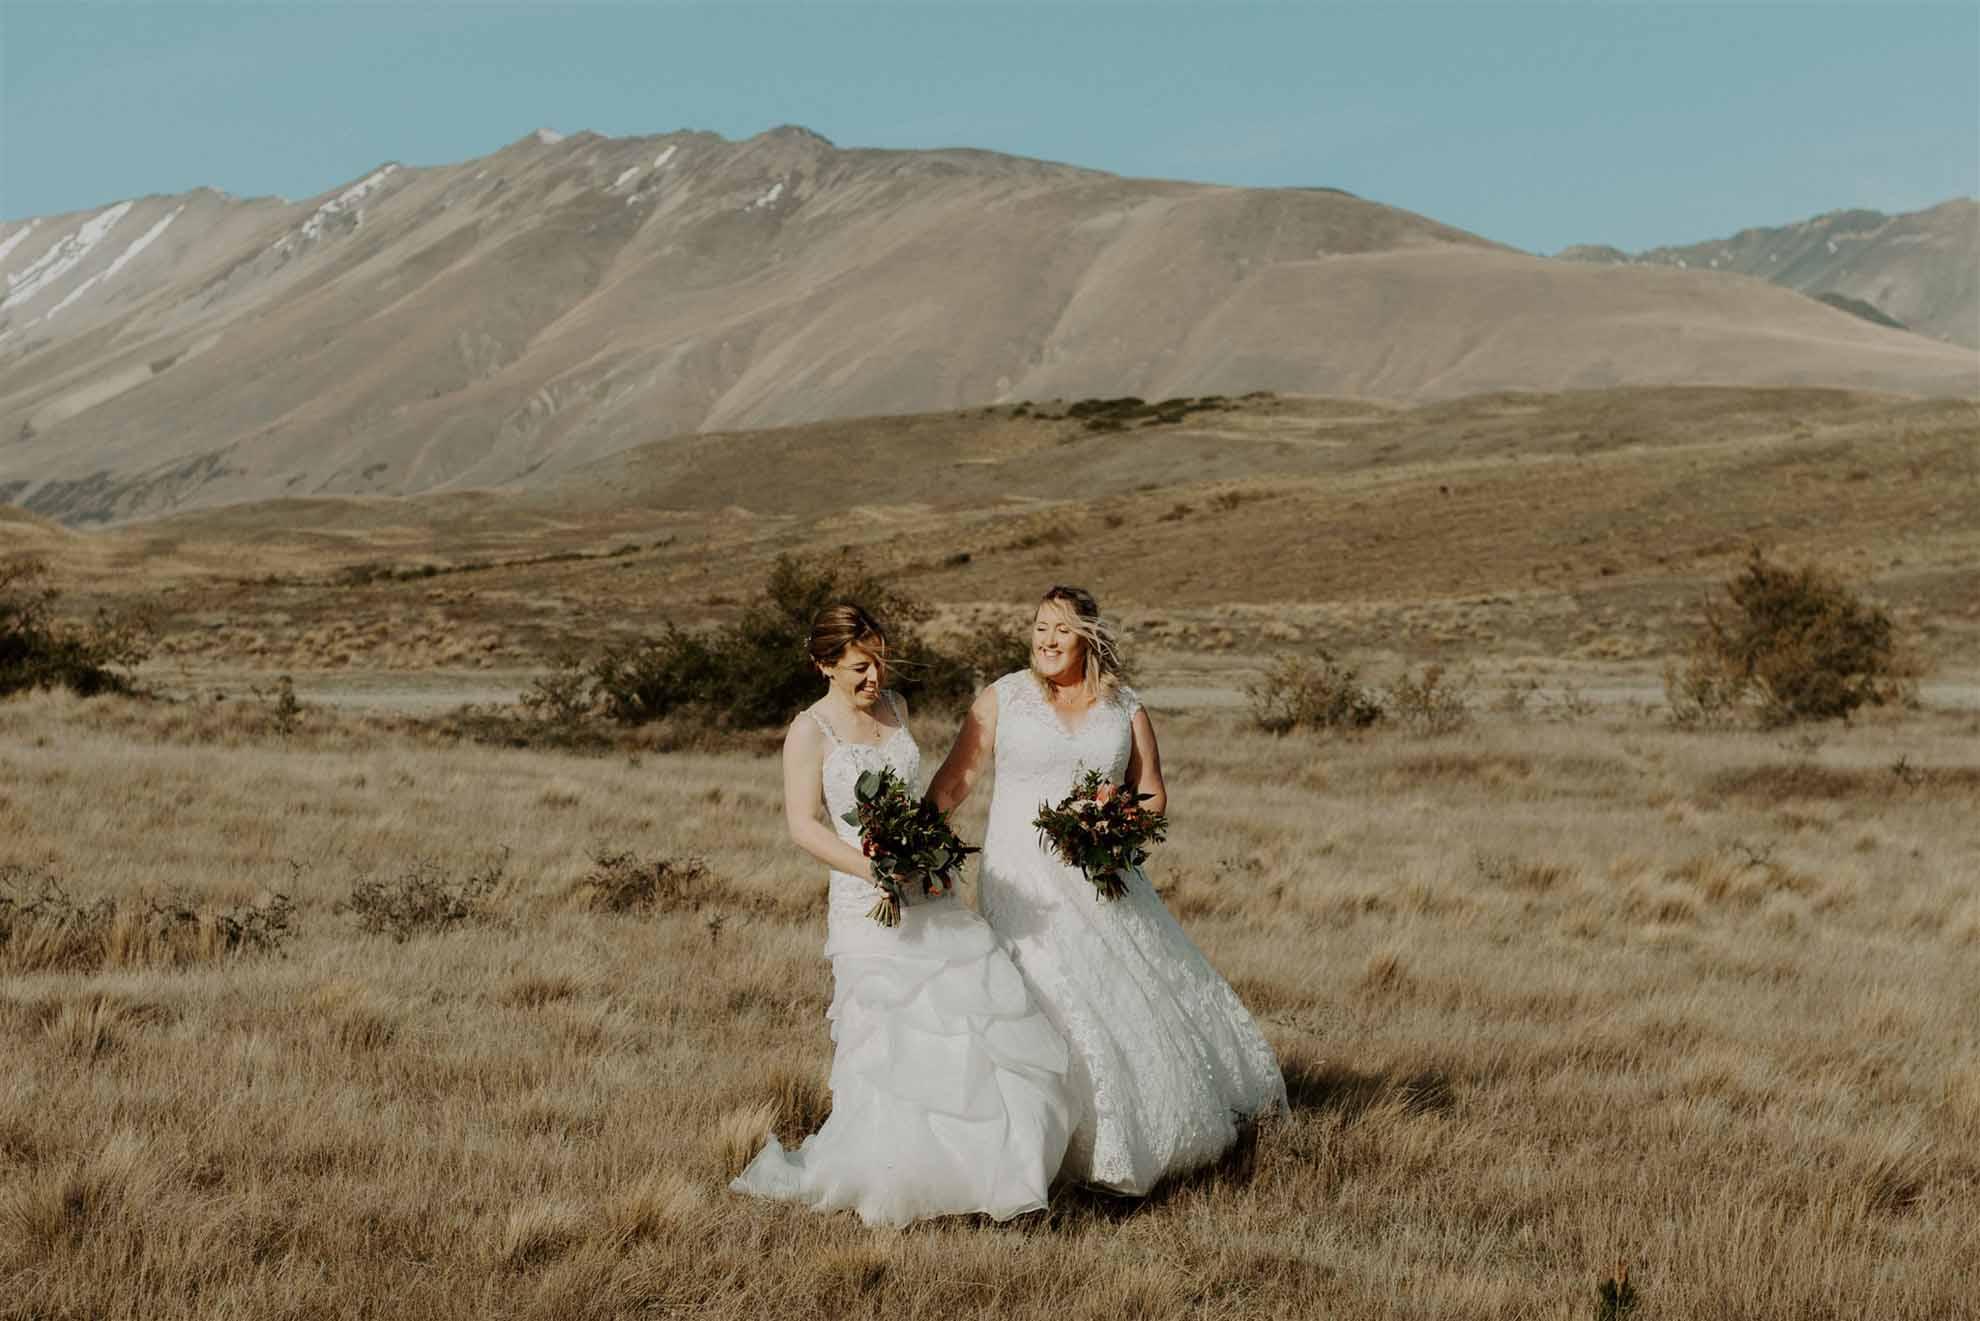 Frankly Faye lgbtqia+ photography lesbian wedding elopement Lake Tekapo New Zealand Dancing With Her magazine (28)